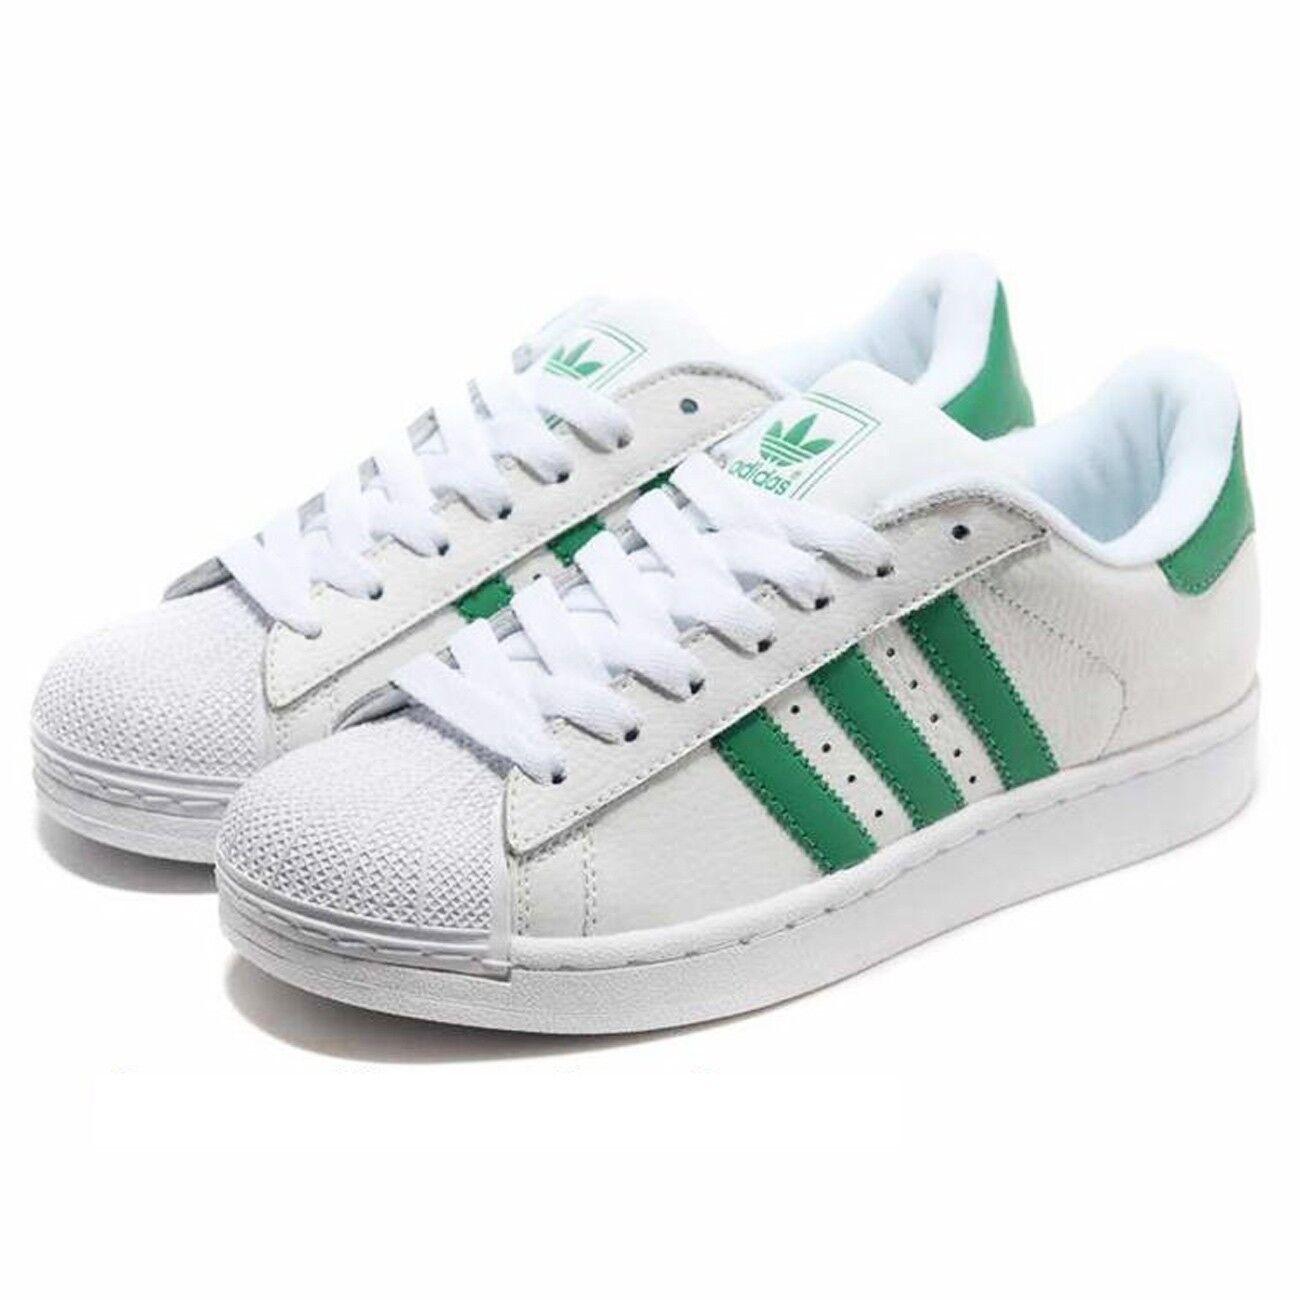 adidas men ` s 17.- superstar 2.trainers.white-green.große größen - 17.- s 19.clearance 8954a7